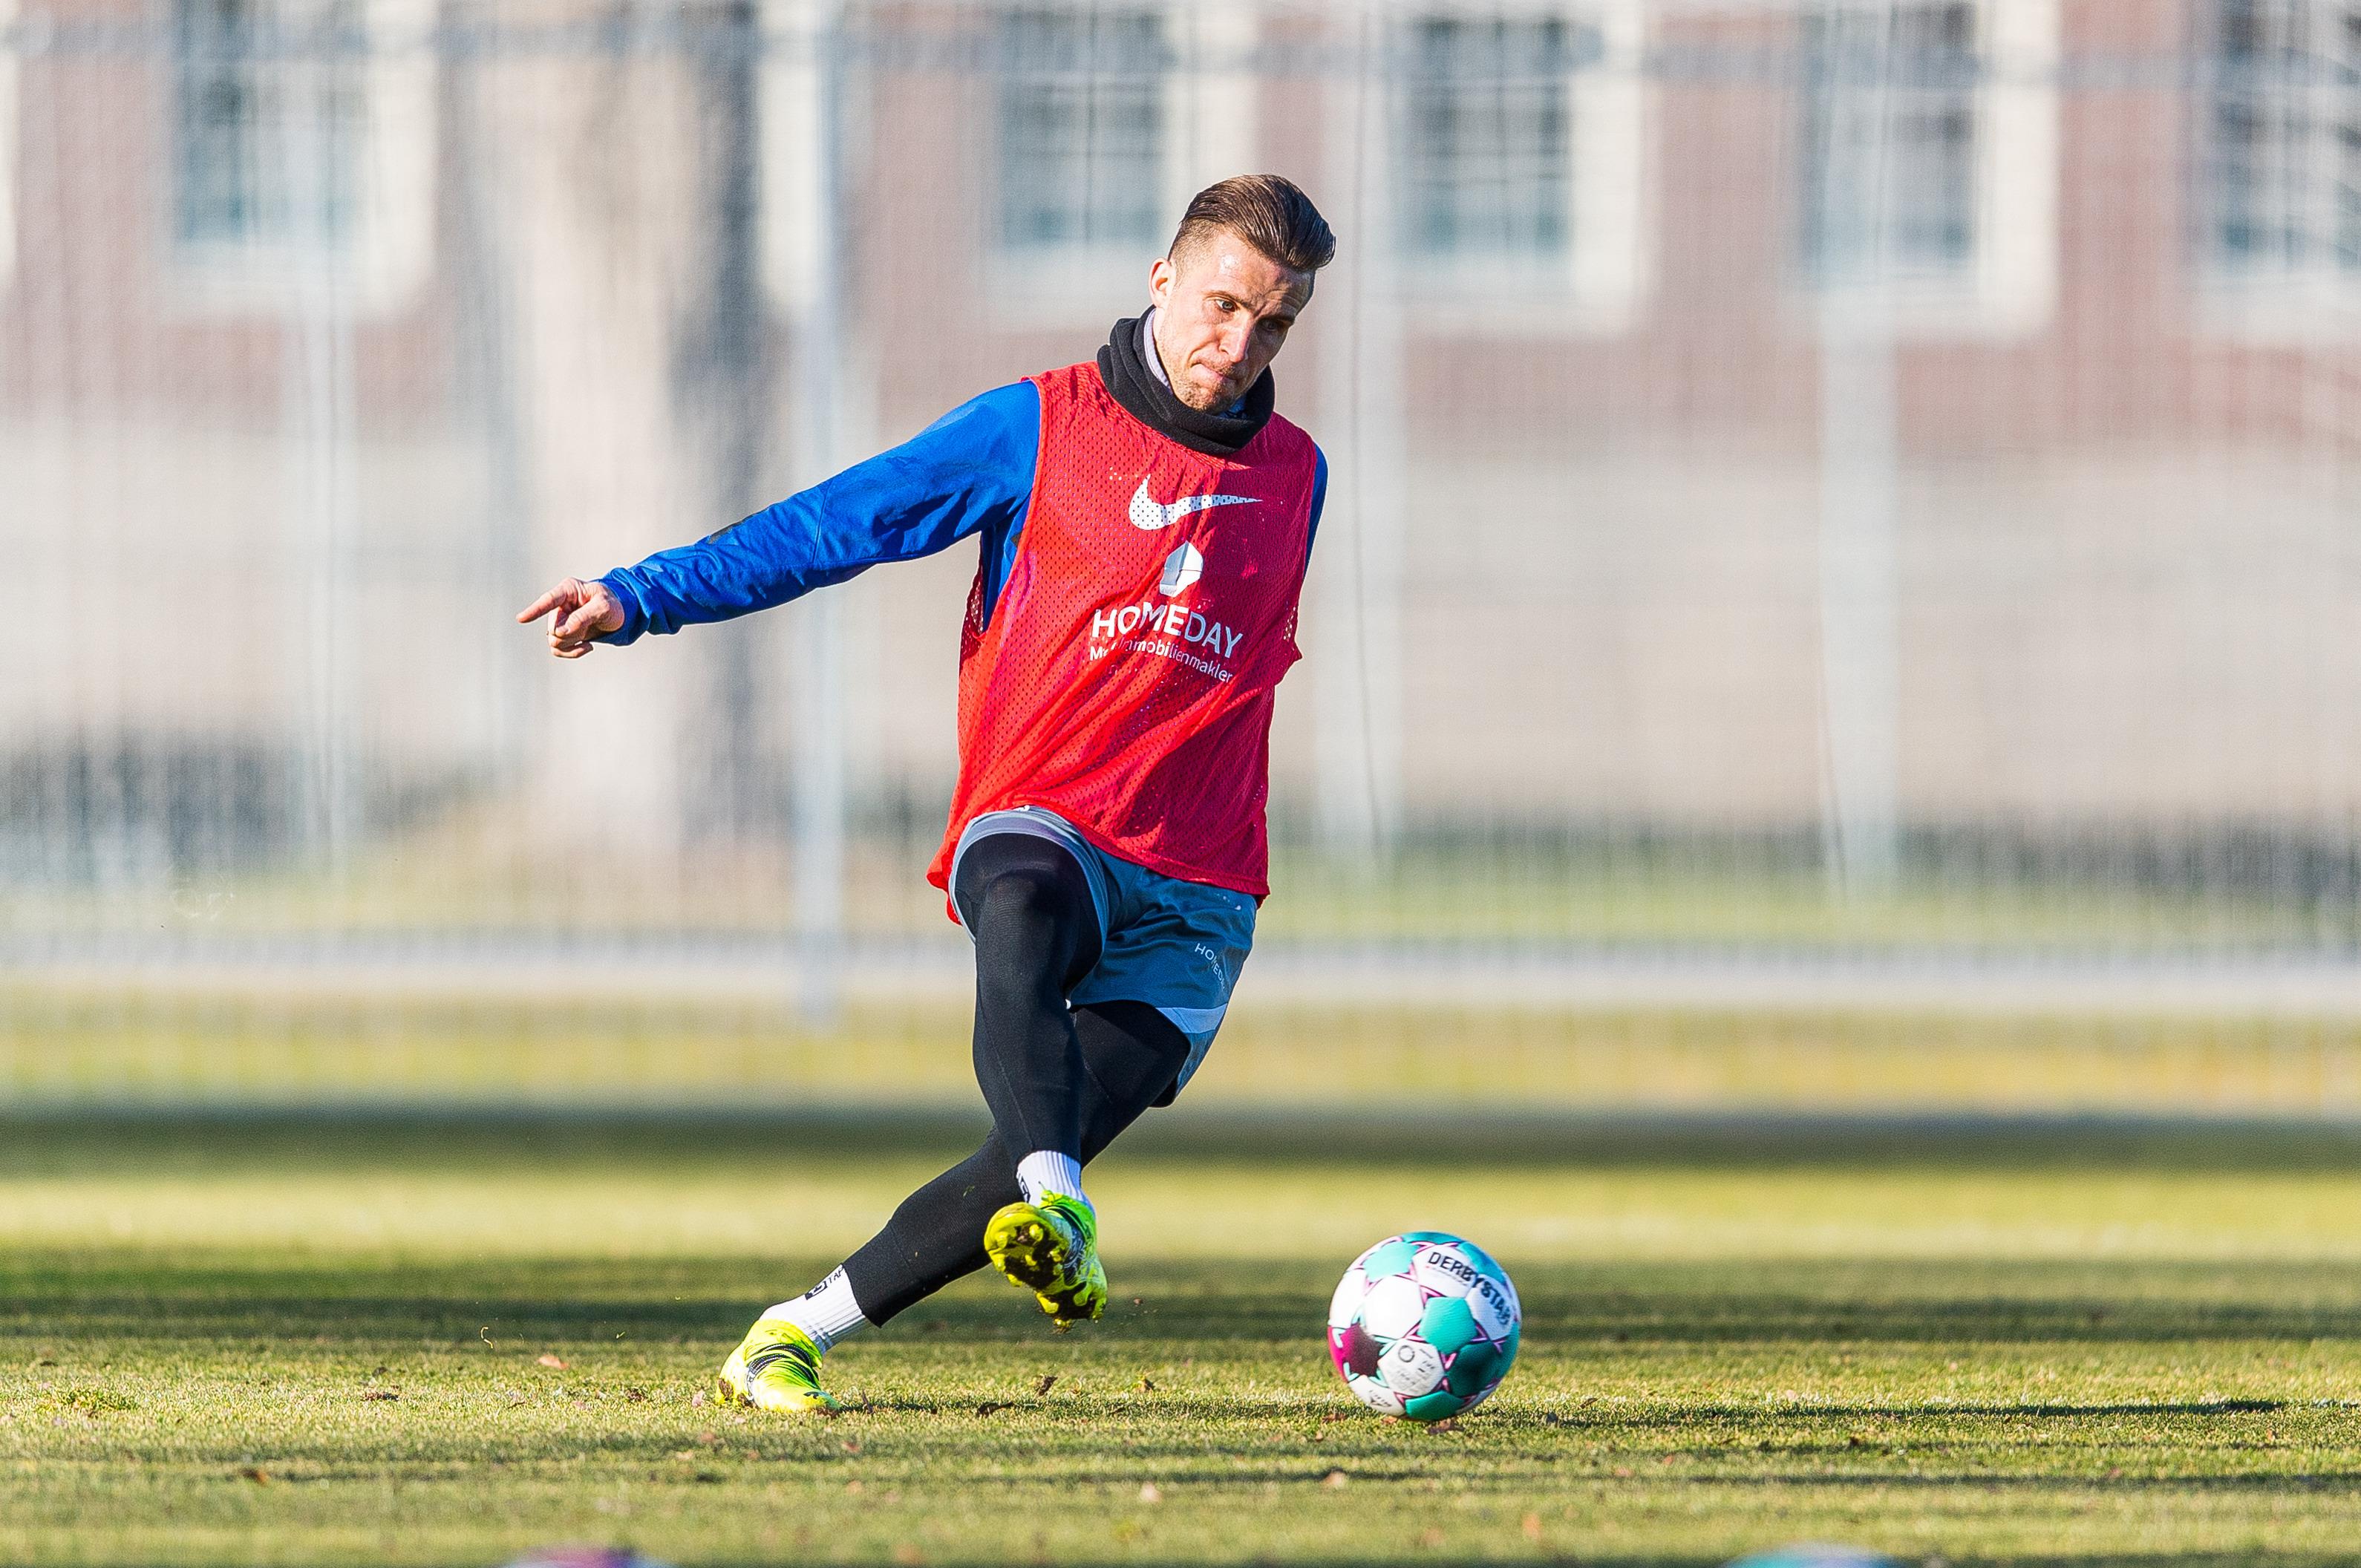 Training on 02.03.21